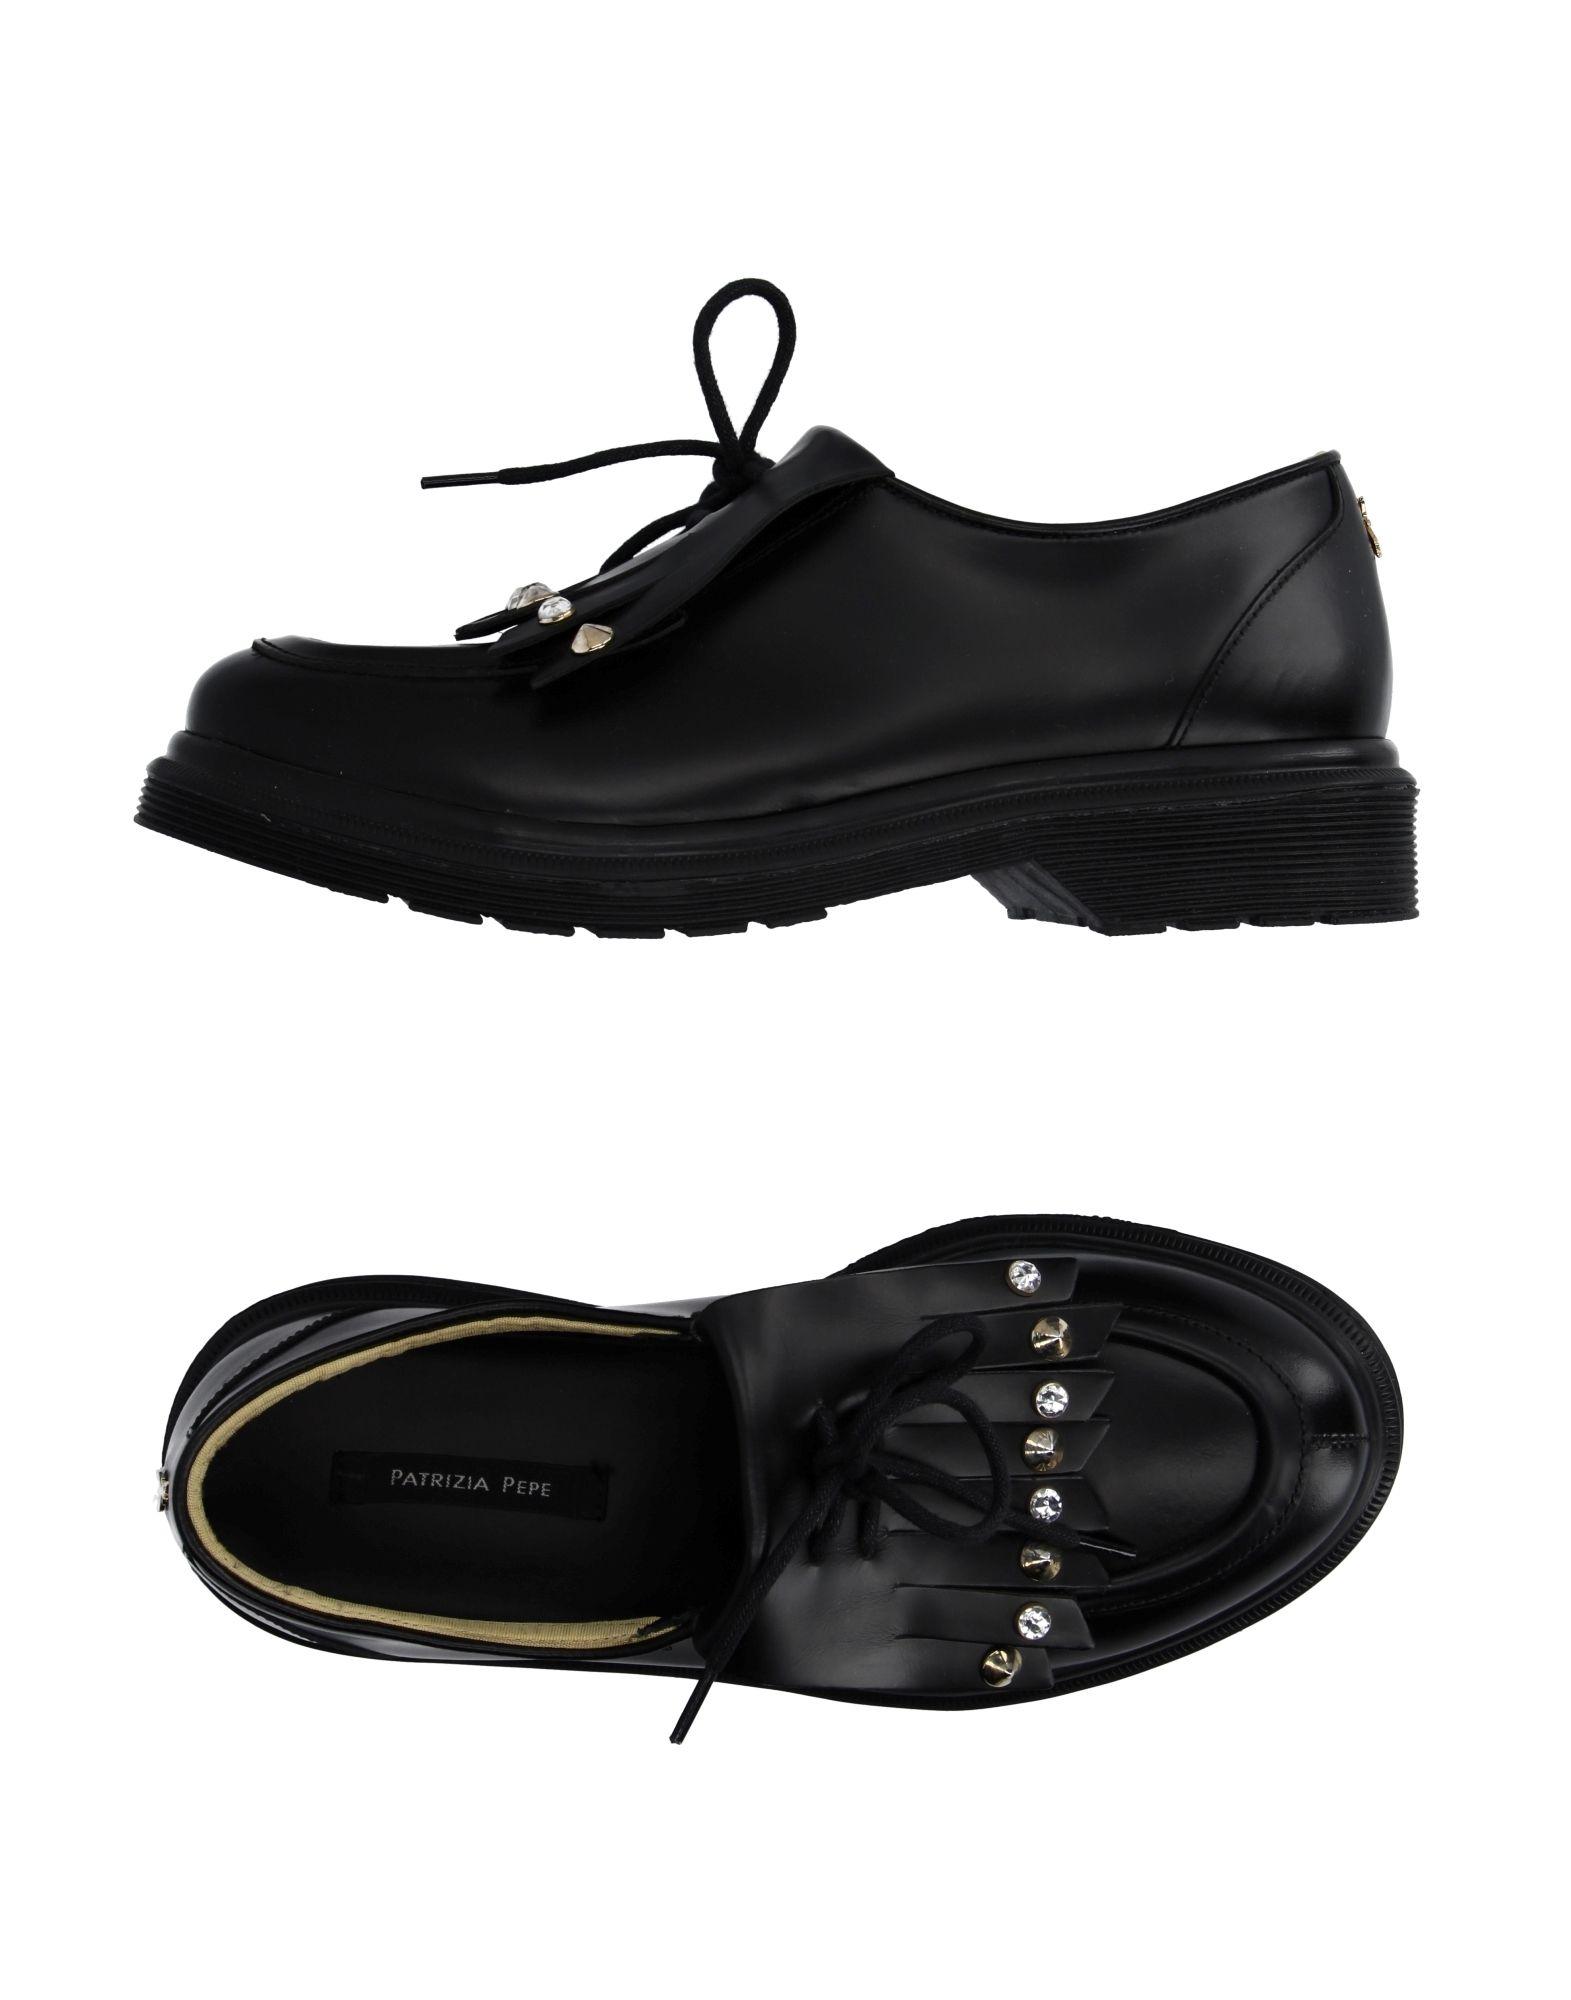 PATRIZIA PEPE Обувь на шнурках patrizia pepe джинсы с 5 карманами с широкими штанинами